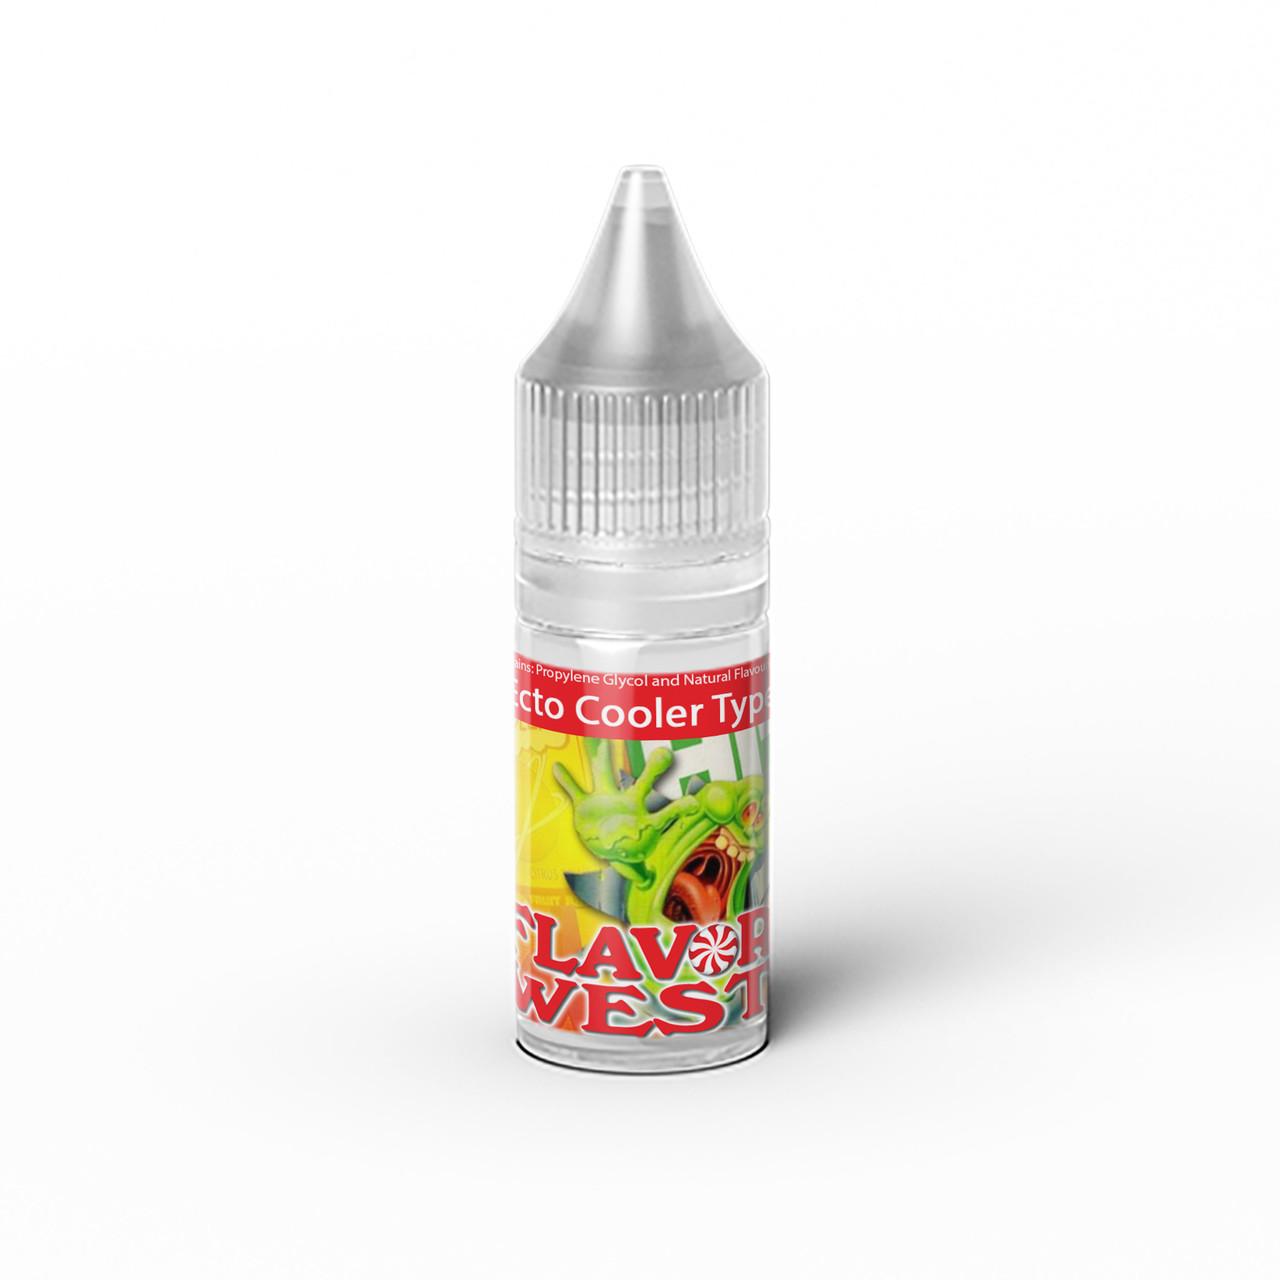 Ароматизатор FlavorWest - Ecto Cooler Type (Экто-кулер), 10 мл.